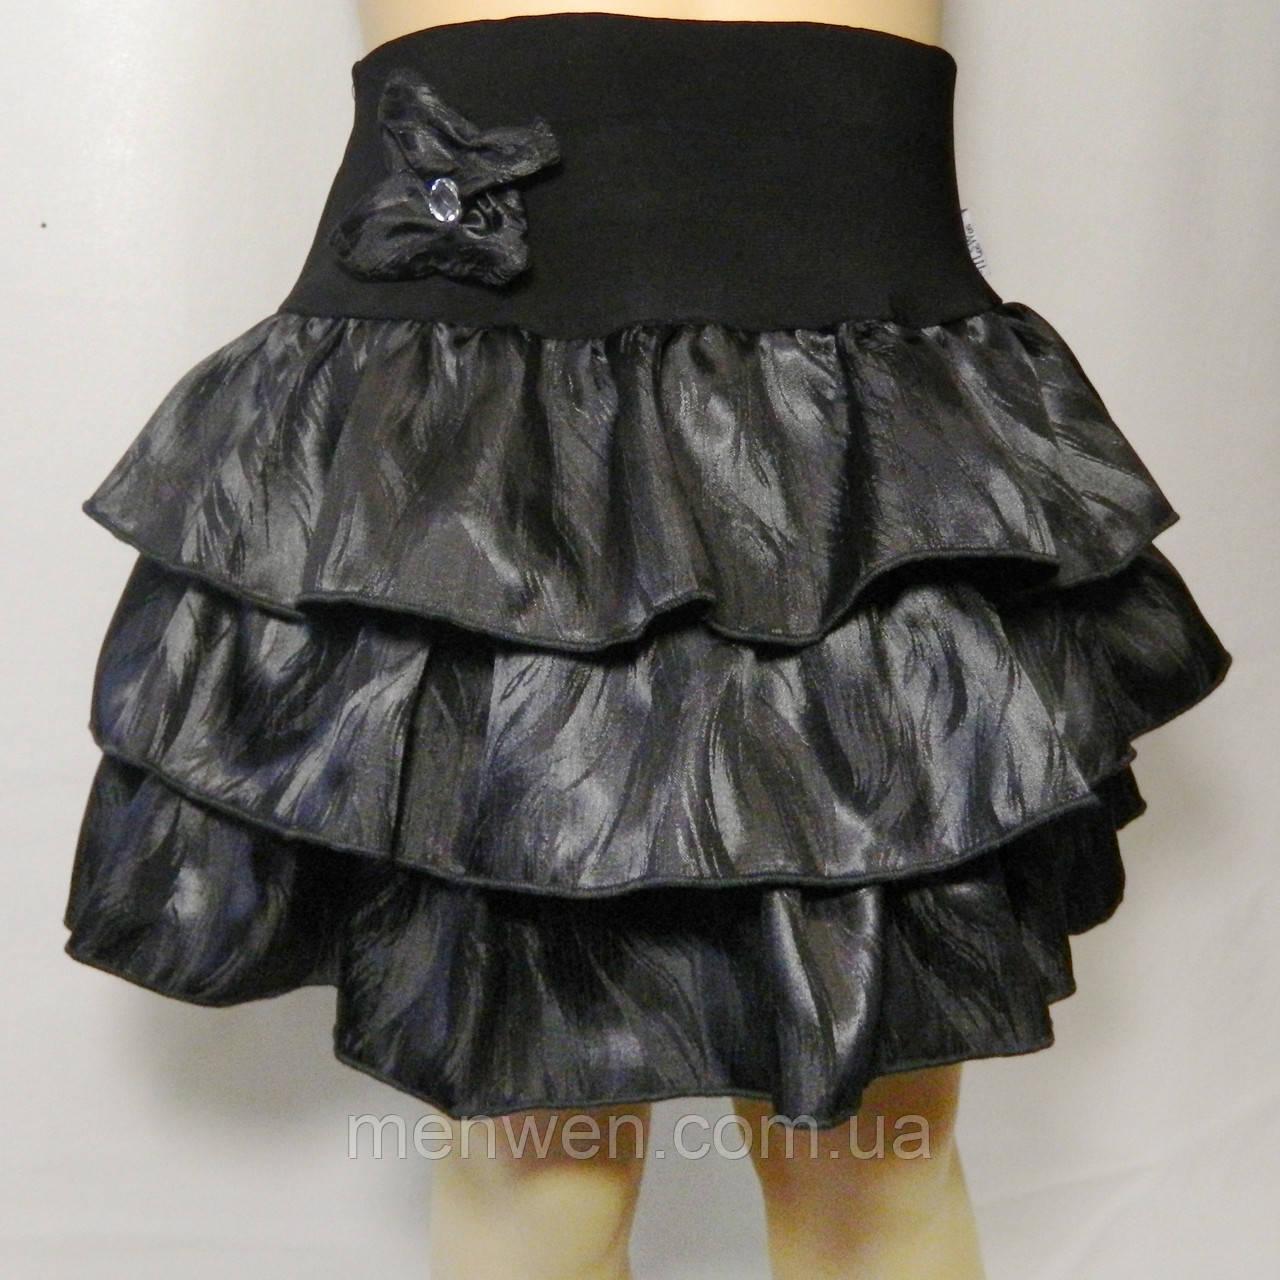 73beb32ed63 Школьная юбка для девочки  продажа